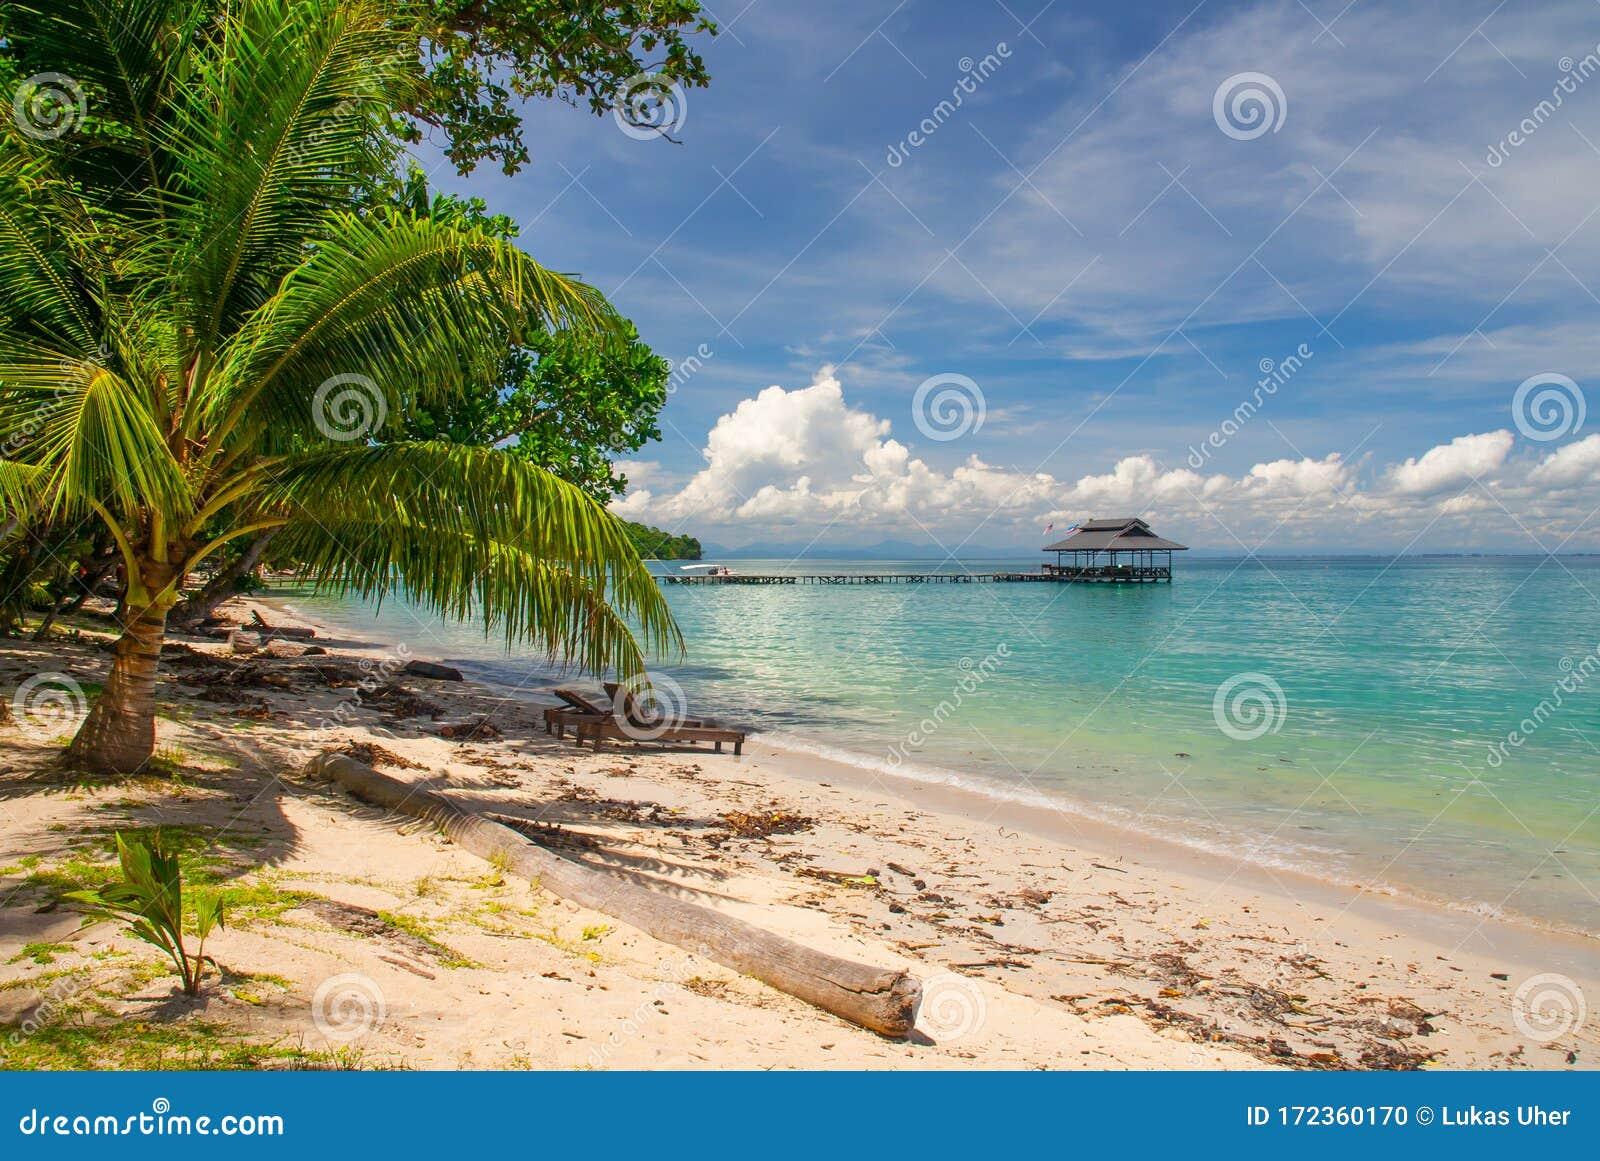 Pulau Tiga - Survivor Island - Sabah, Malaysian Borneo